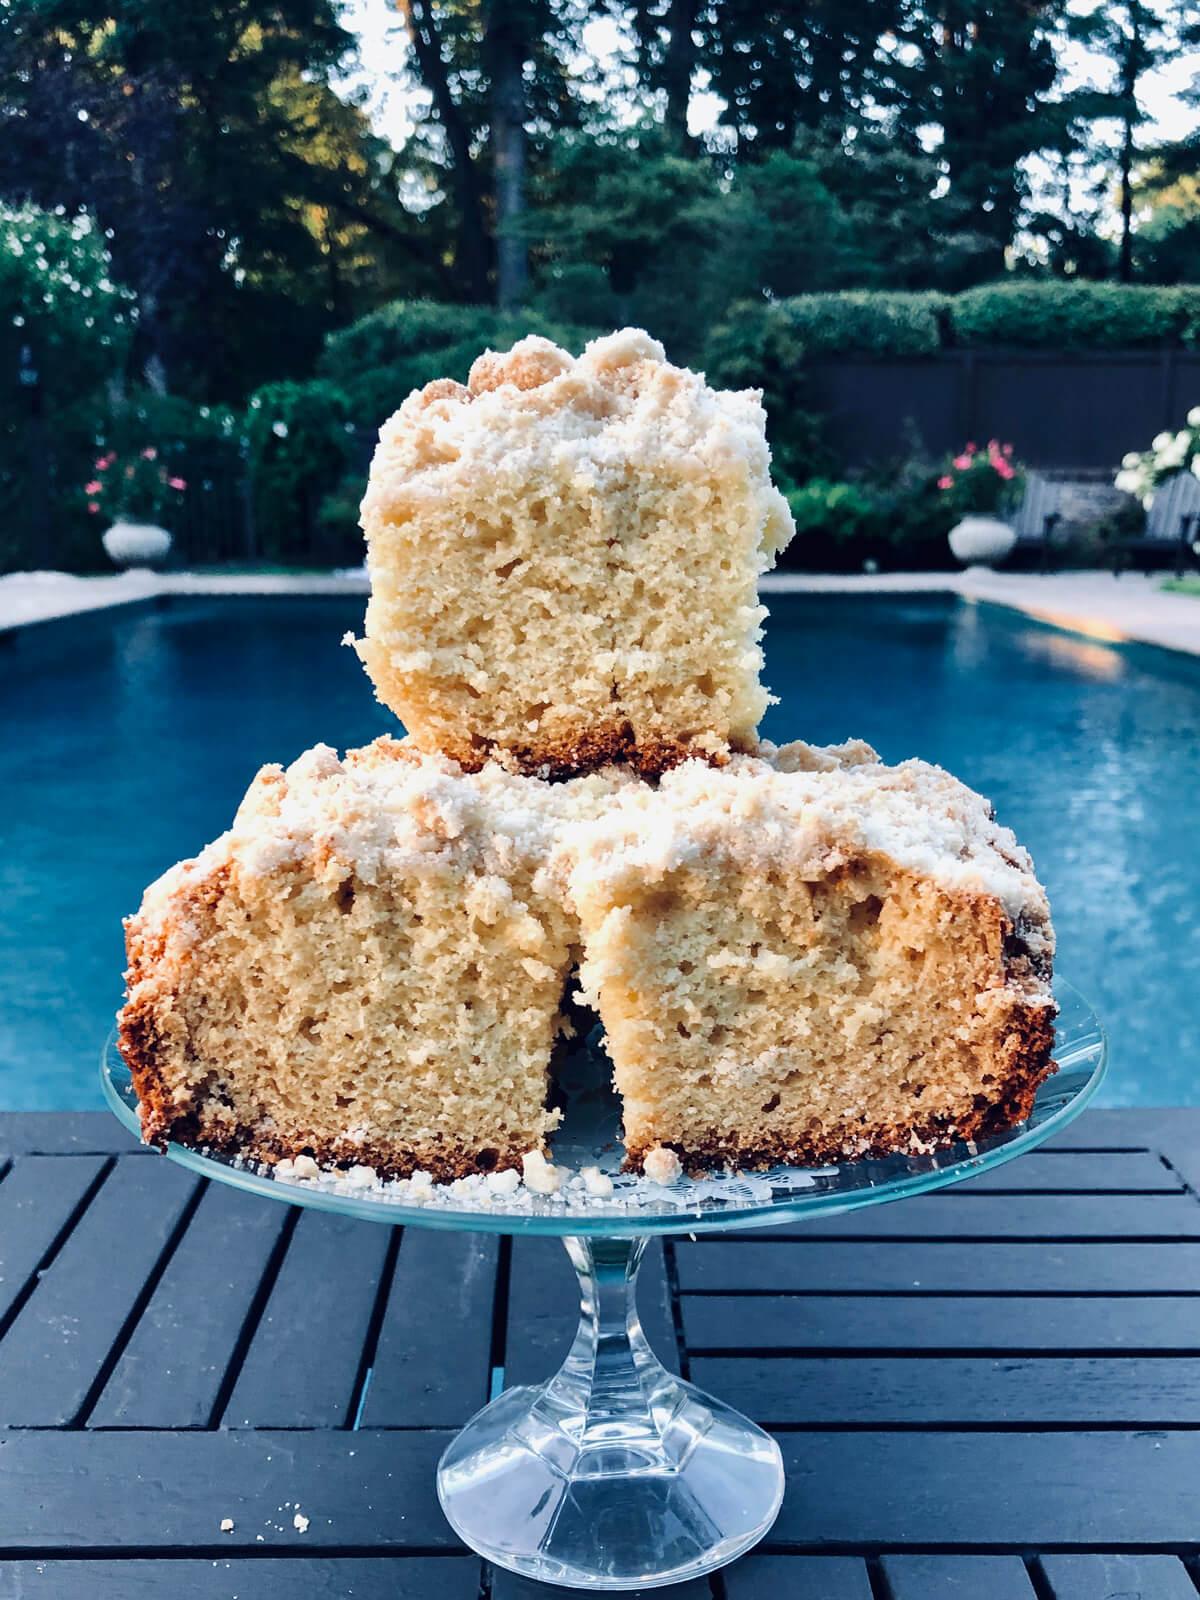 Nanny's Butter Streusel Cake